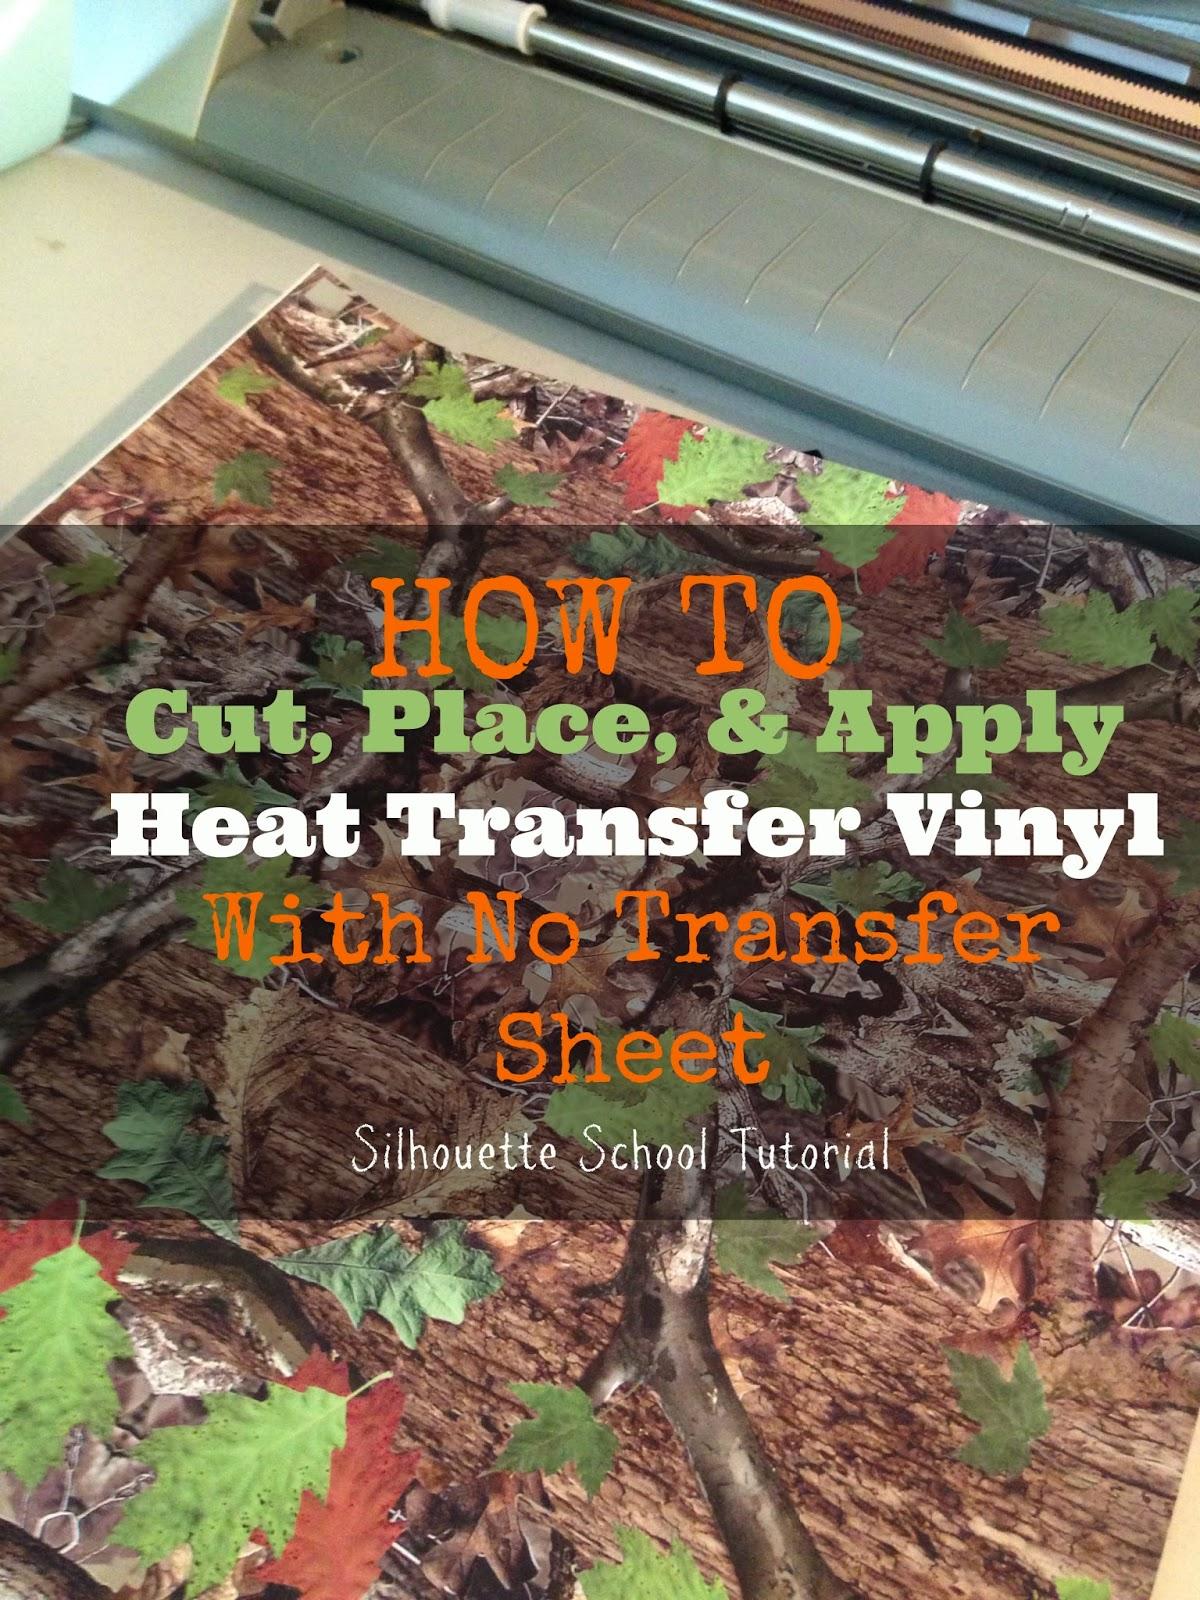 Silhouette tutorial, HTV, heat transfer vinyl, no transfer sheet, silhouette 101